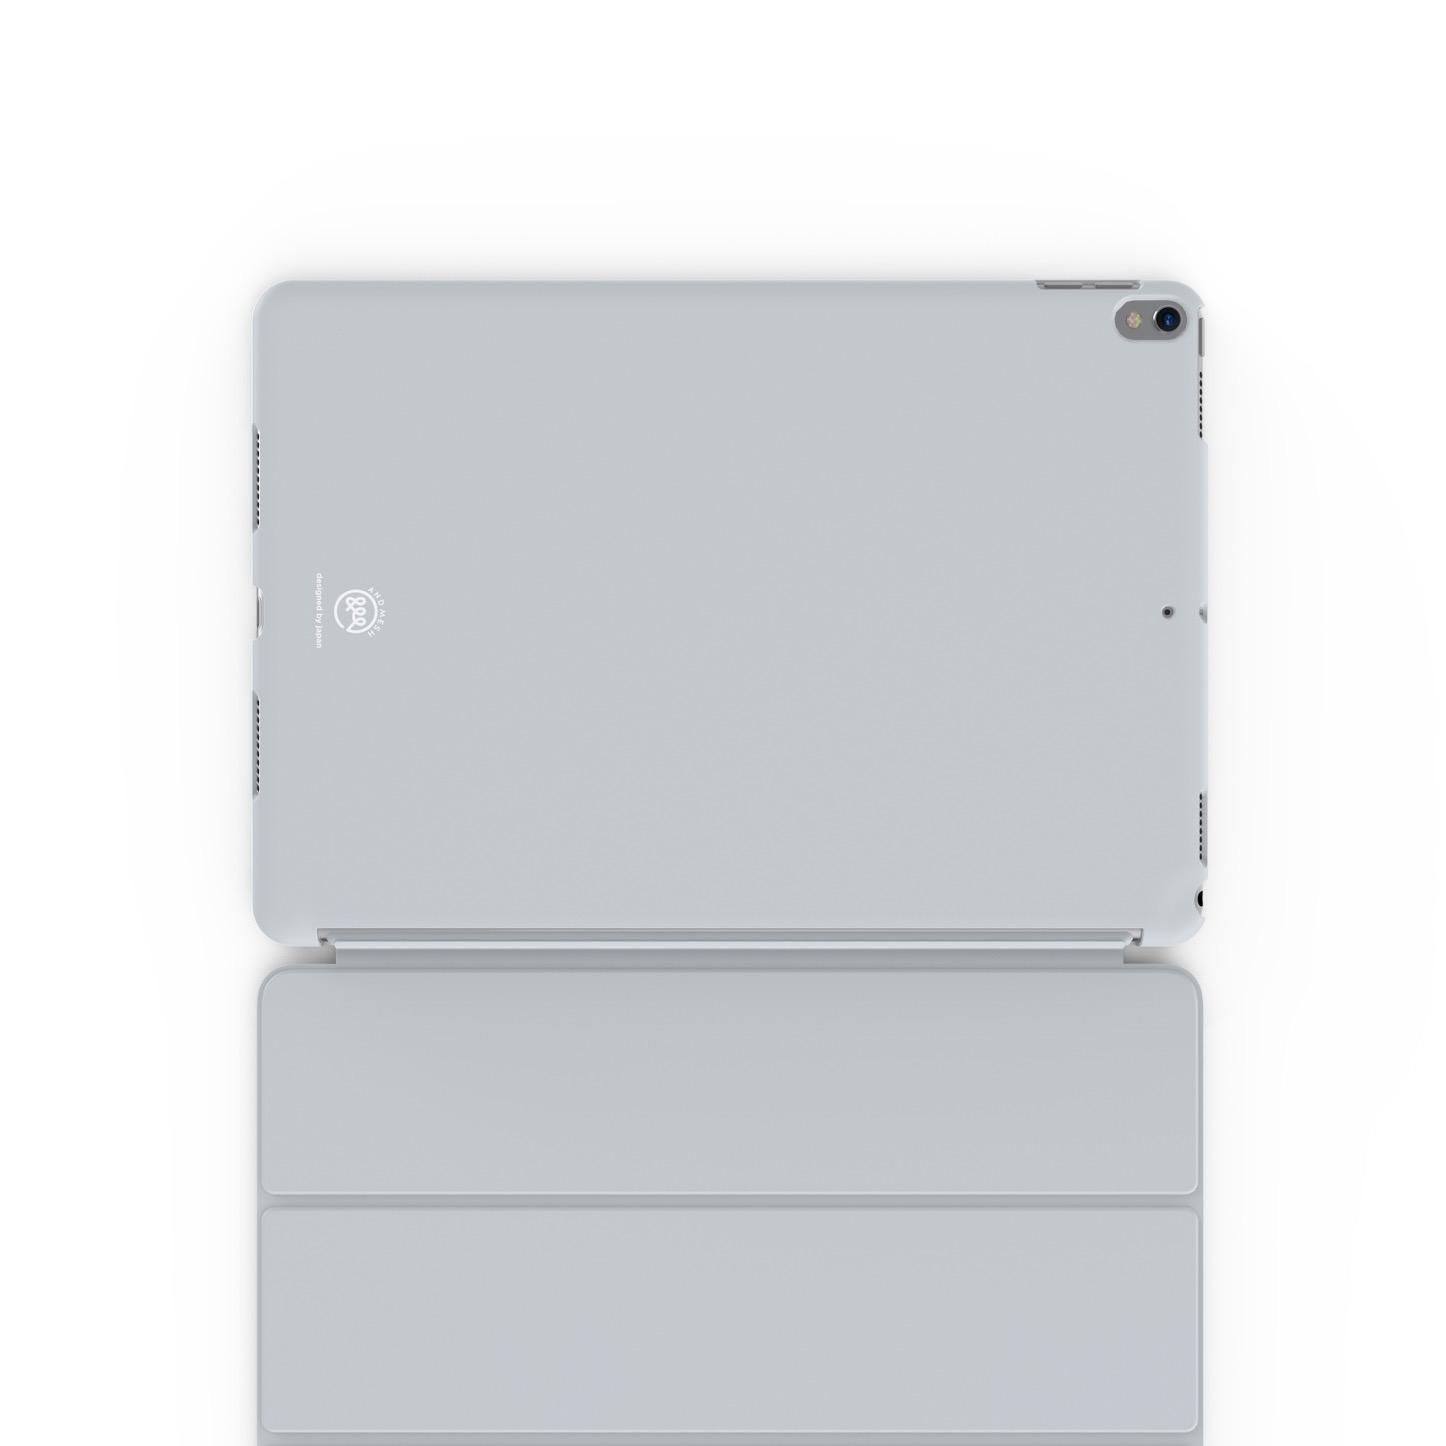 AndMesh-iPad-Pro-10_5-09.jpg